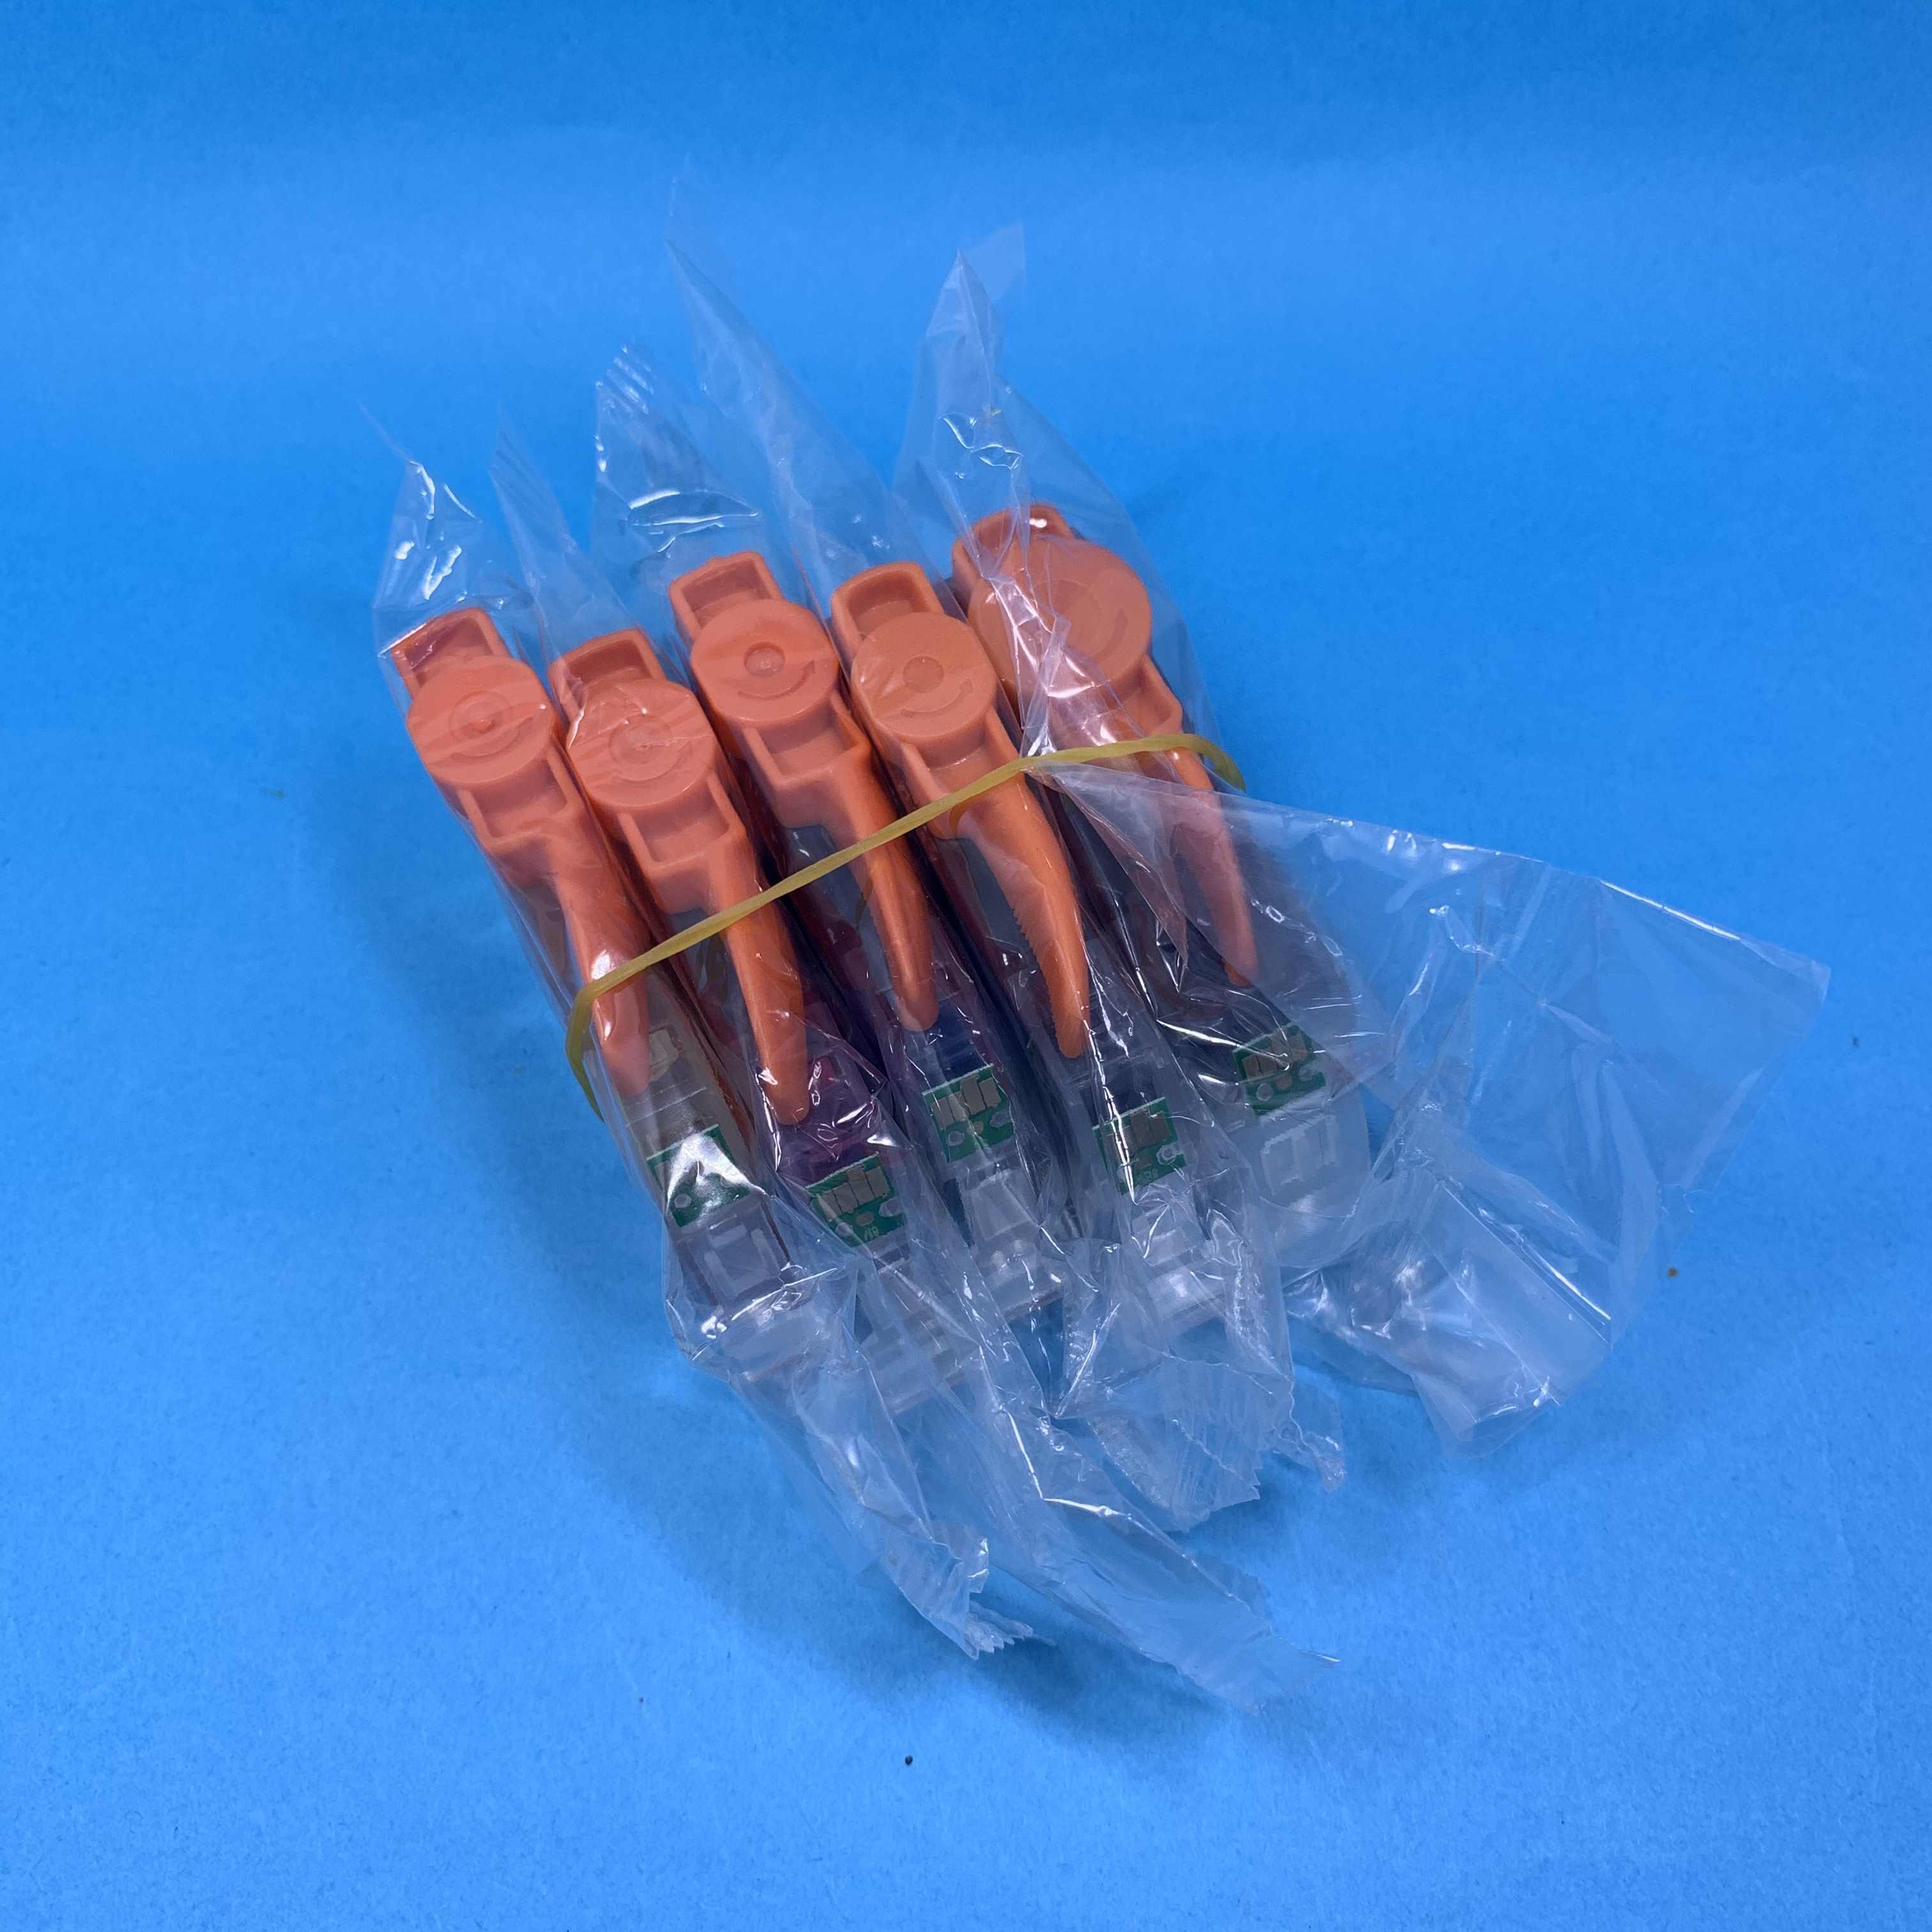 Yotat 5 Pcs PGI5 Ink Cartridge PGI-5 CLI-8 untuk Canon PIXMA IP4200 IP4300 IP4500 MP500 IP5200 MP530 MP600 MP610 MP800 printer